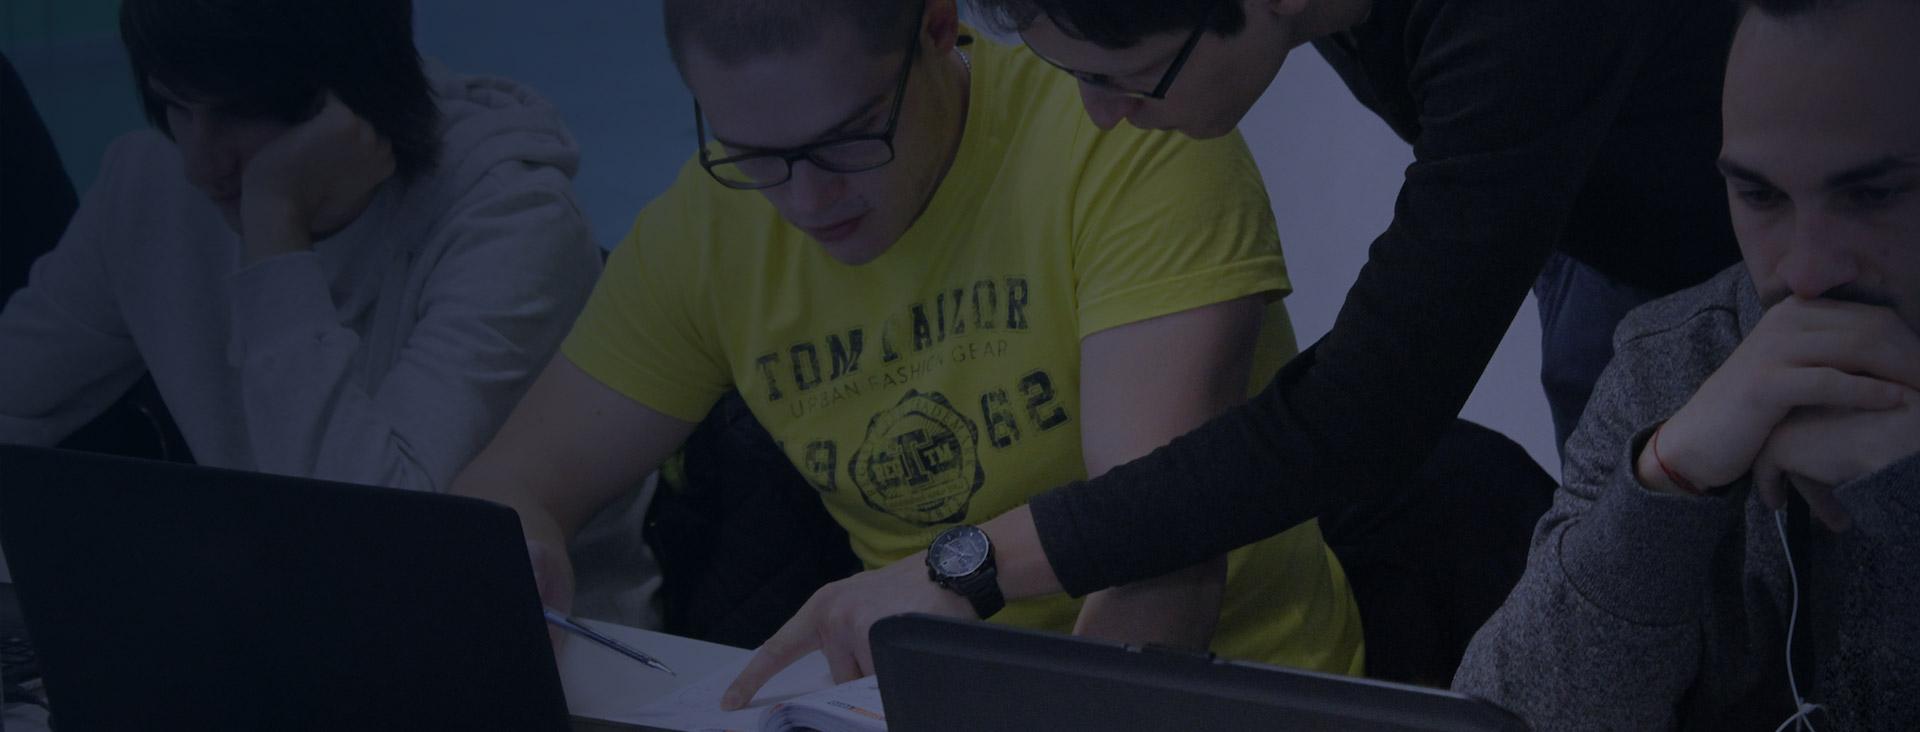 JavaScript Workshops